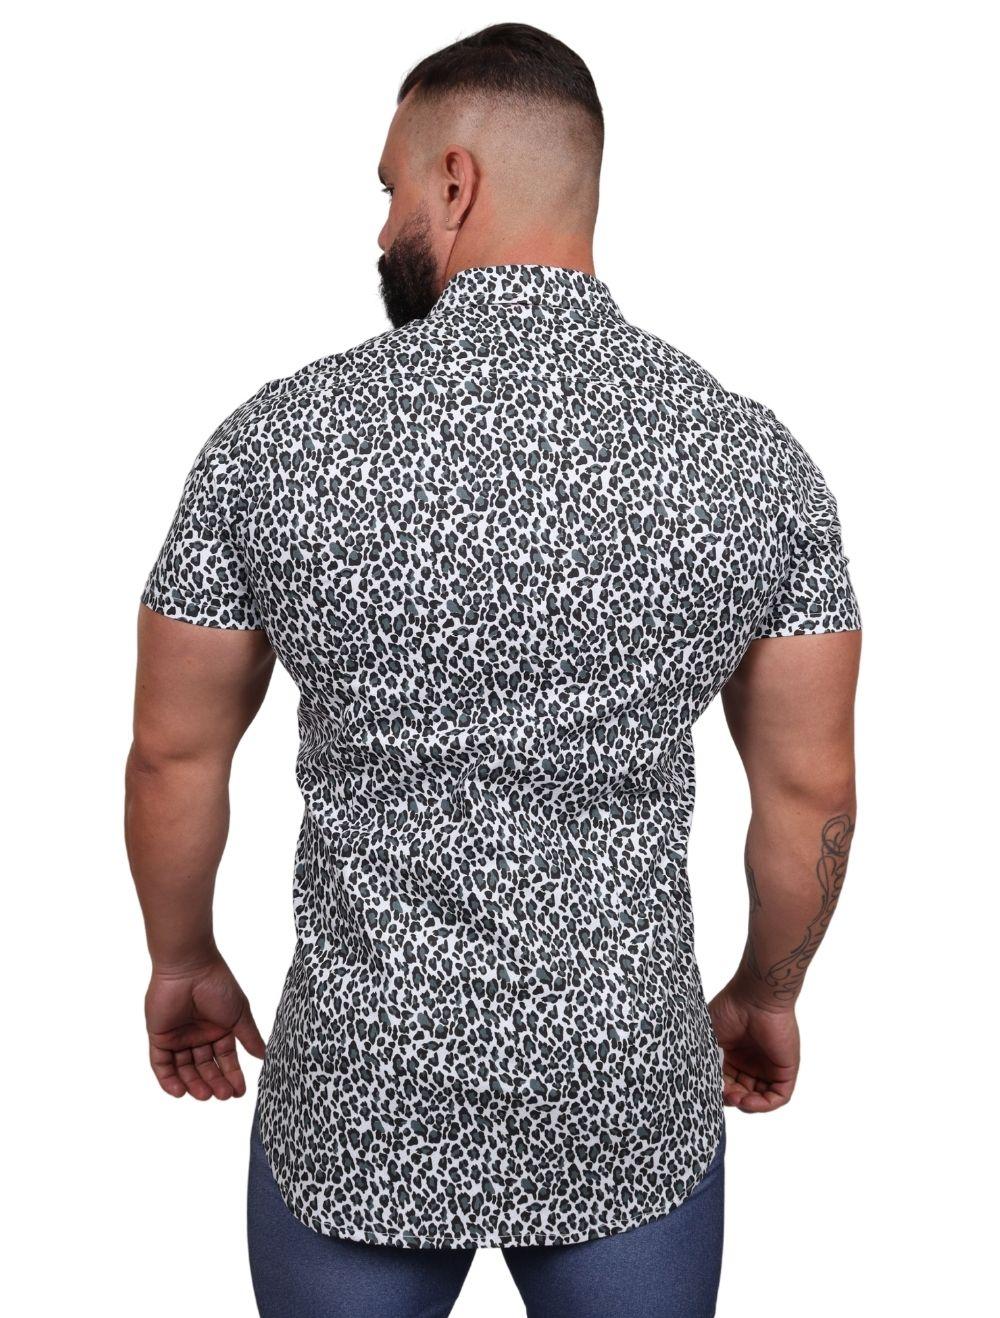 Camisa Masculina Slim Manga Curta com Elastano Animal Print